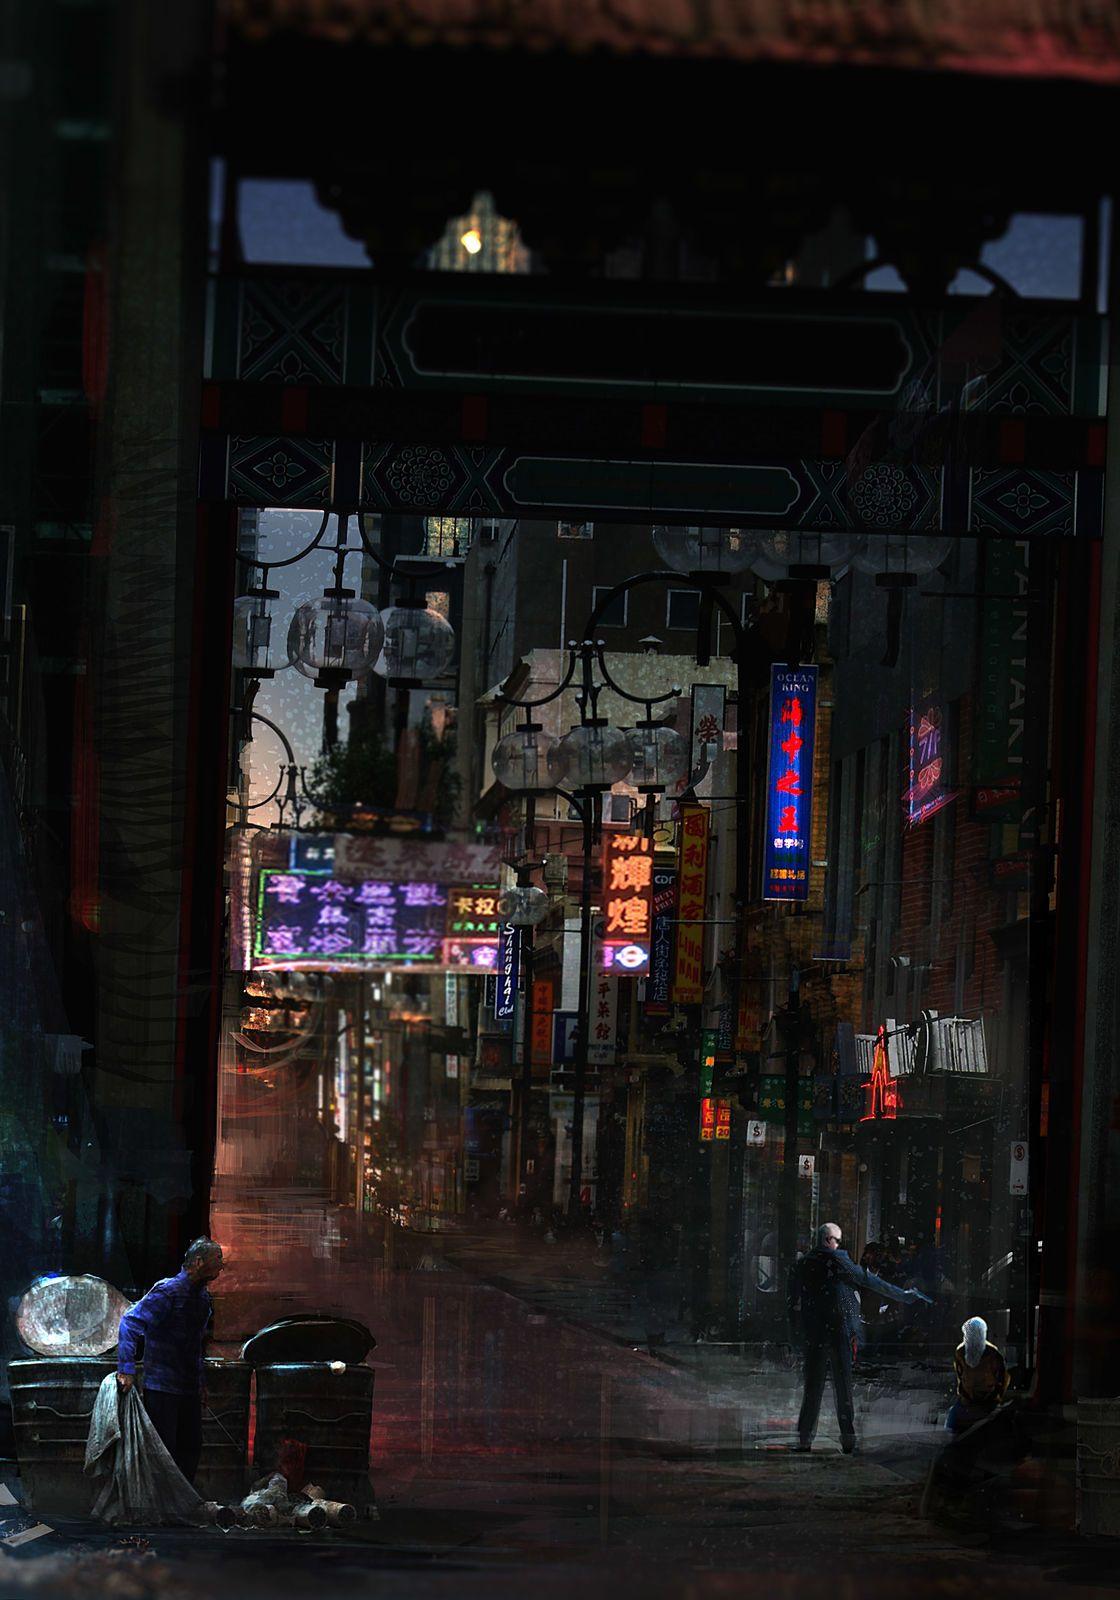 Cyberpunk Artworks - Inspiration Art In